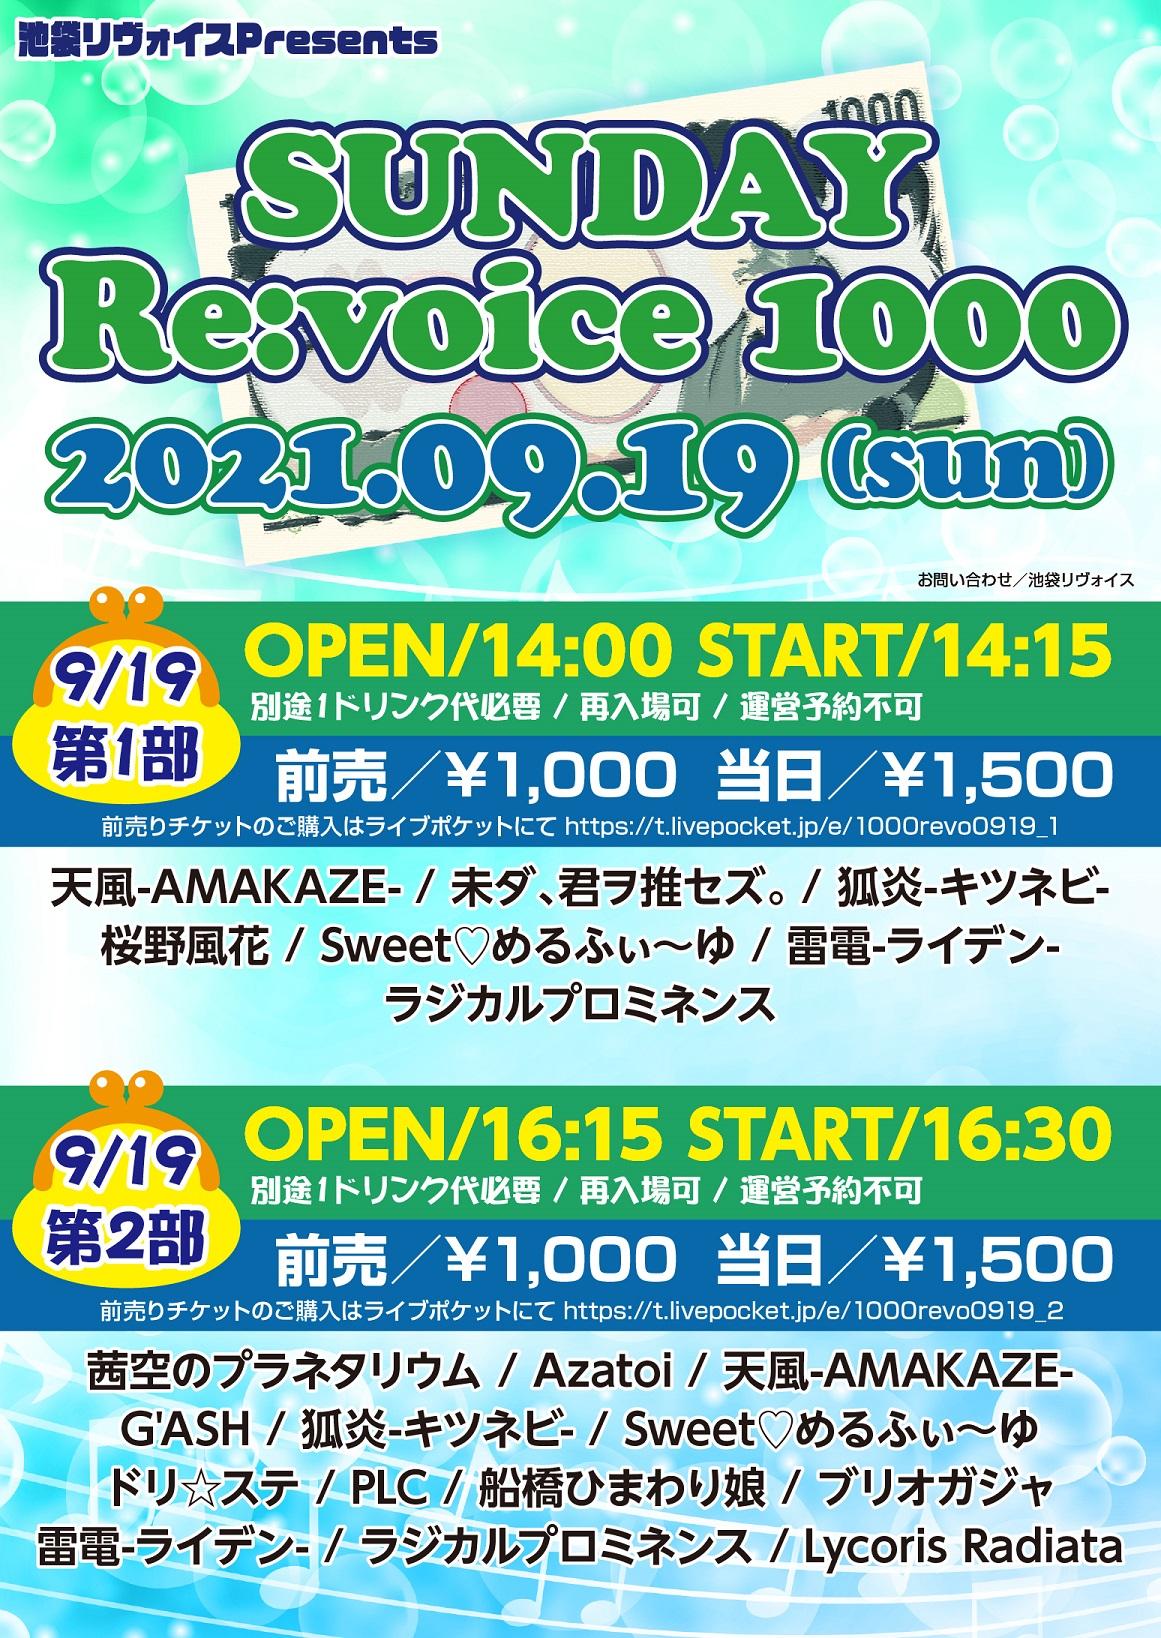 【第二部】SUNDAY Re:voice 1000